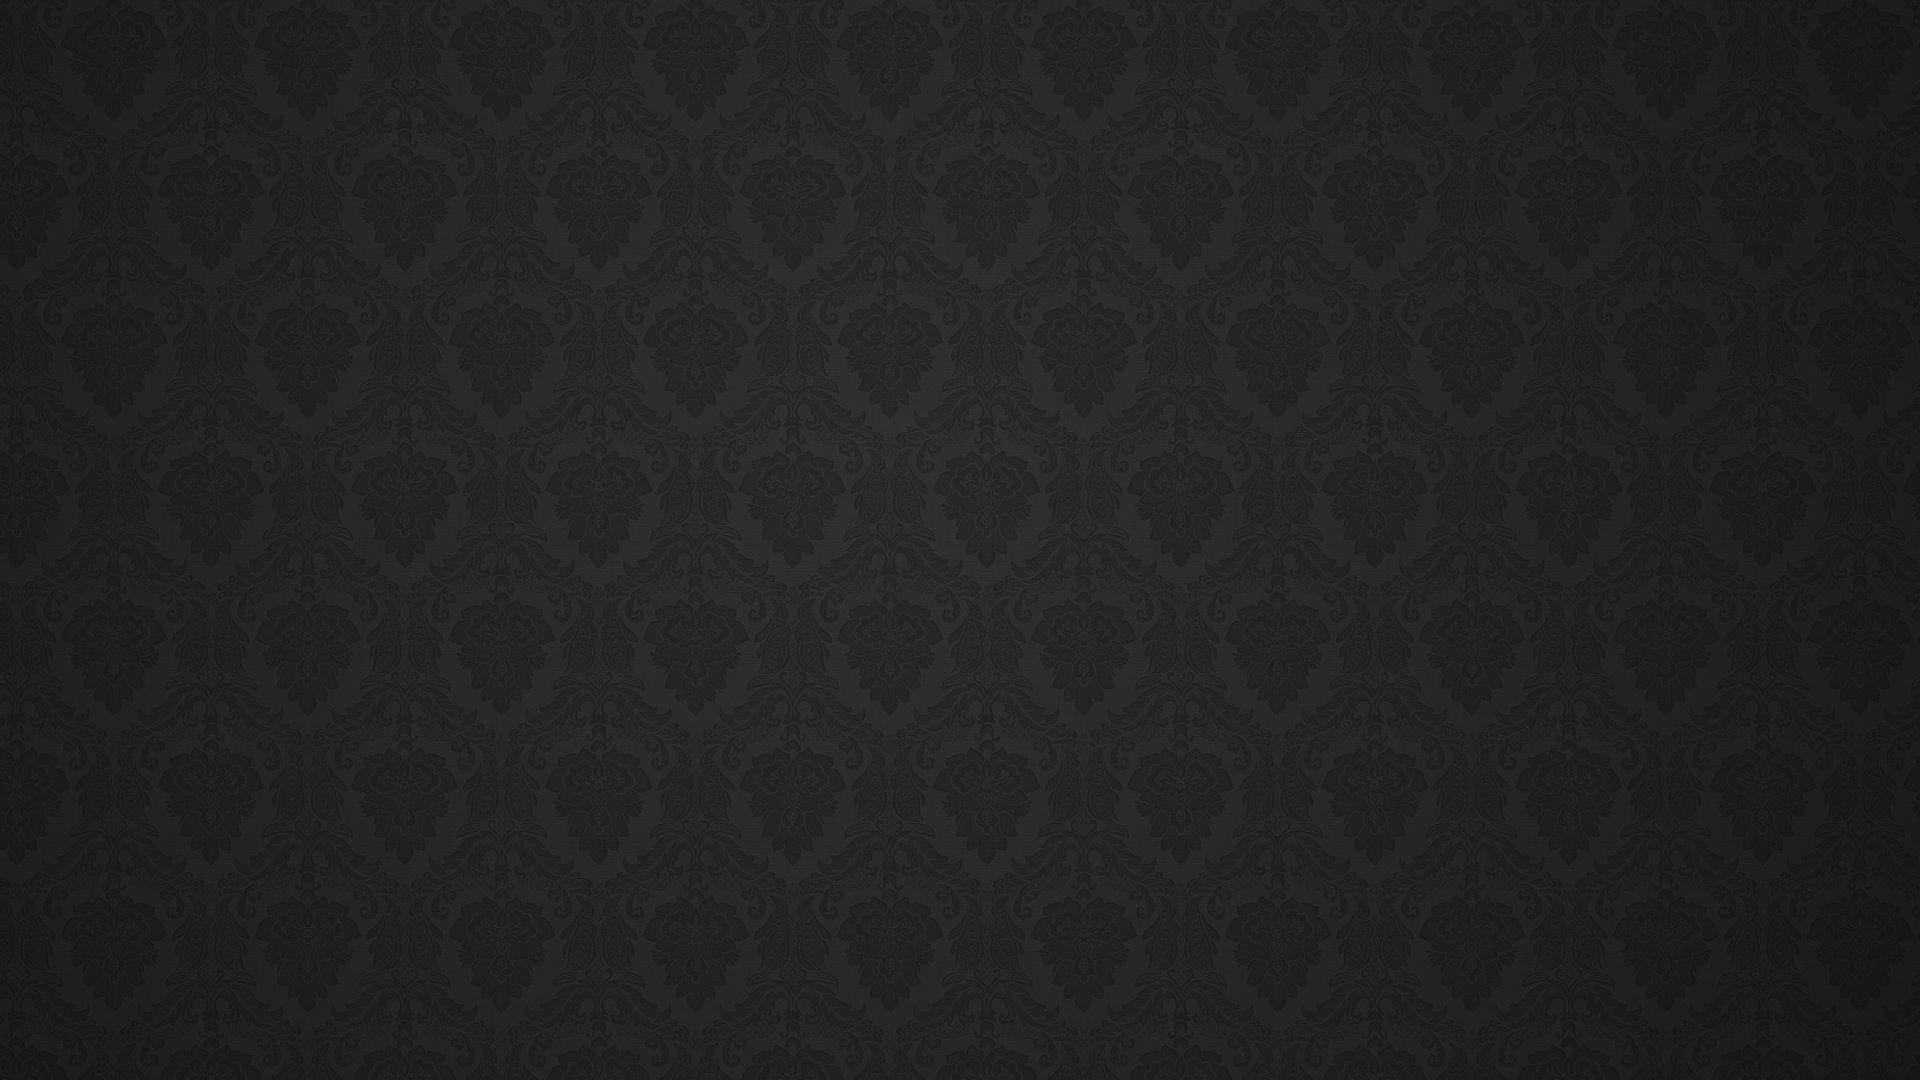 Plain Black new wallpaper